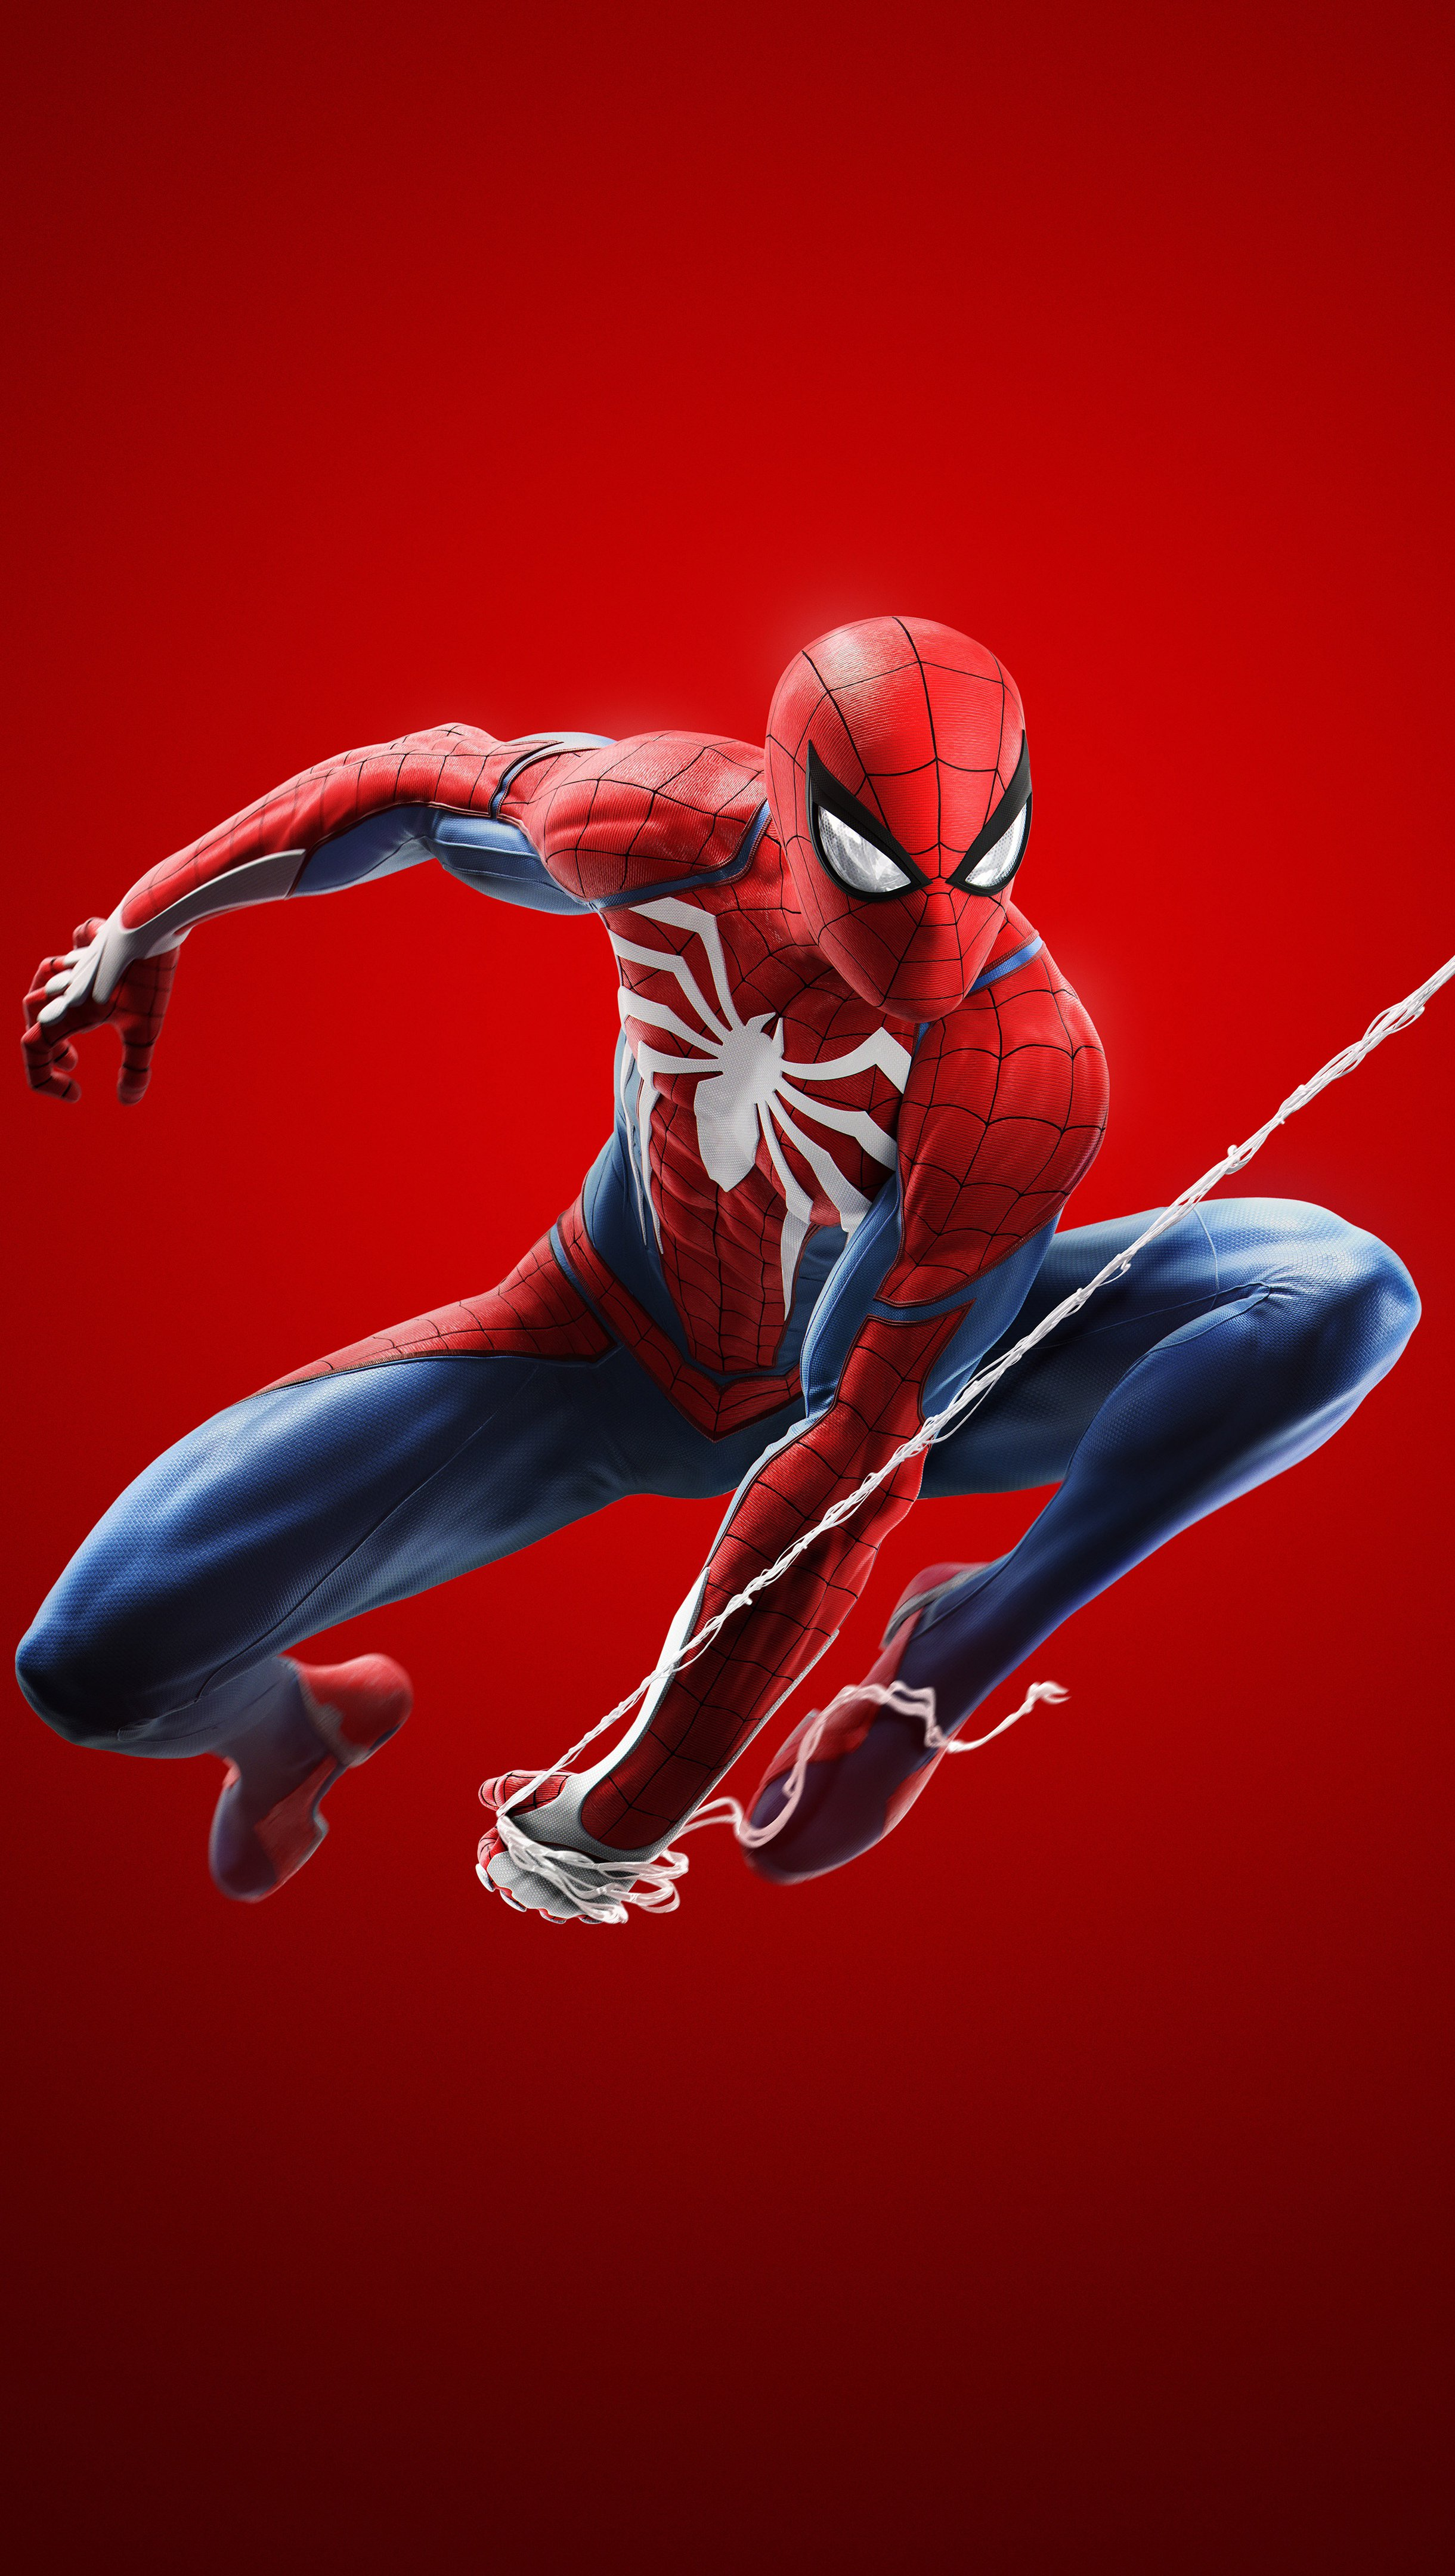 Fondos de pantalla Spider-Man PS4 Vertical